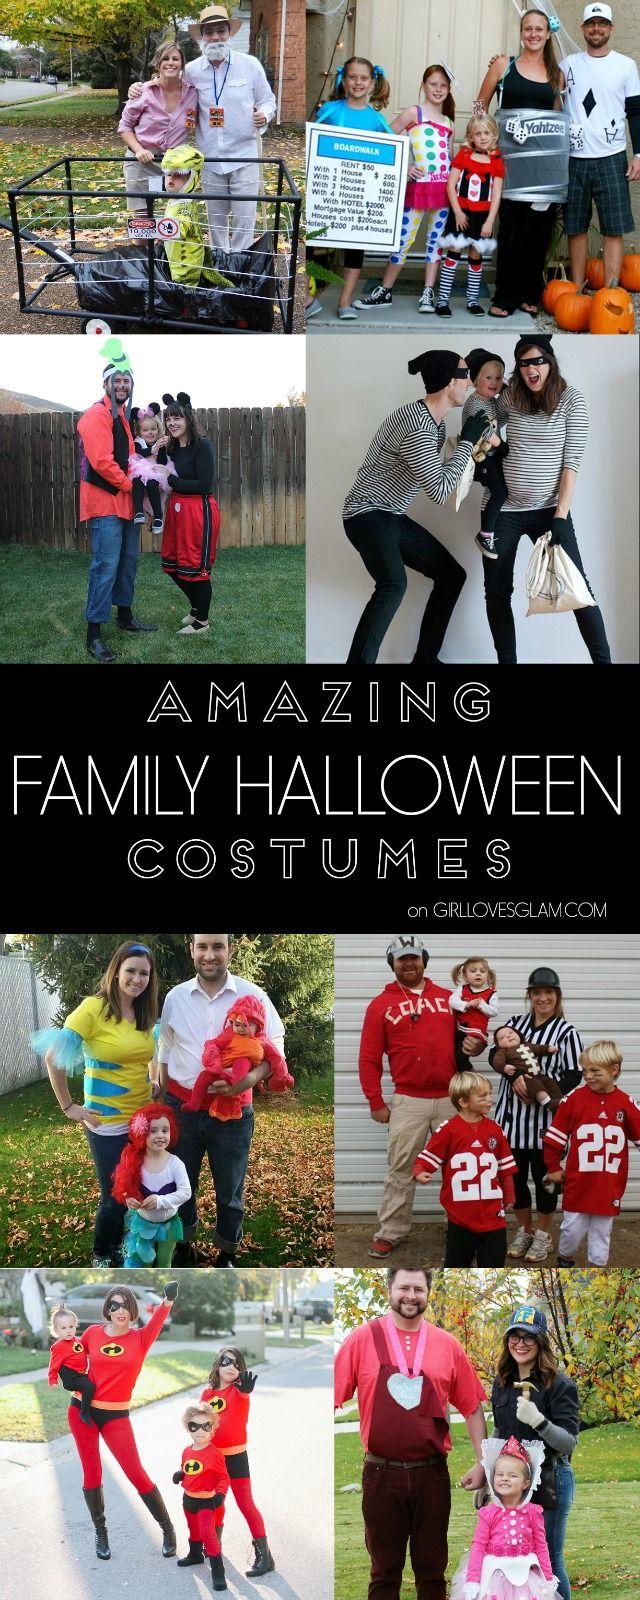 Amazing Family Halloween Costumes on www.girllovesglam.com